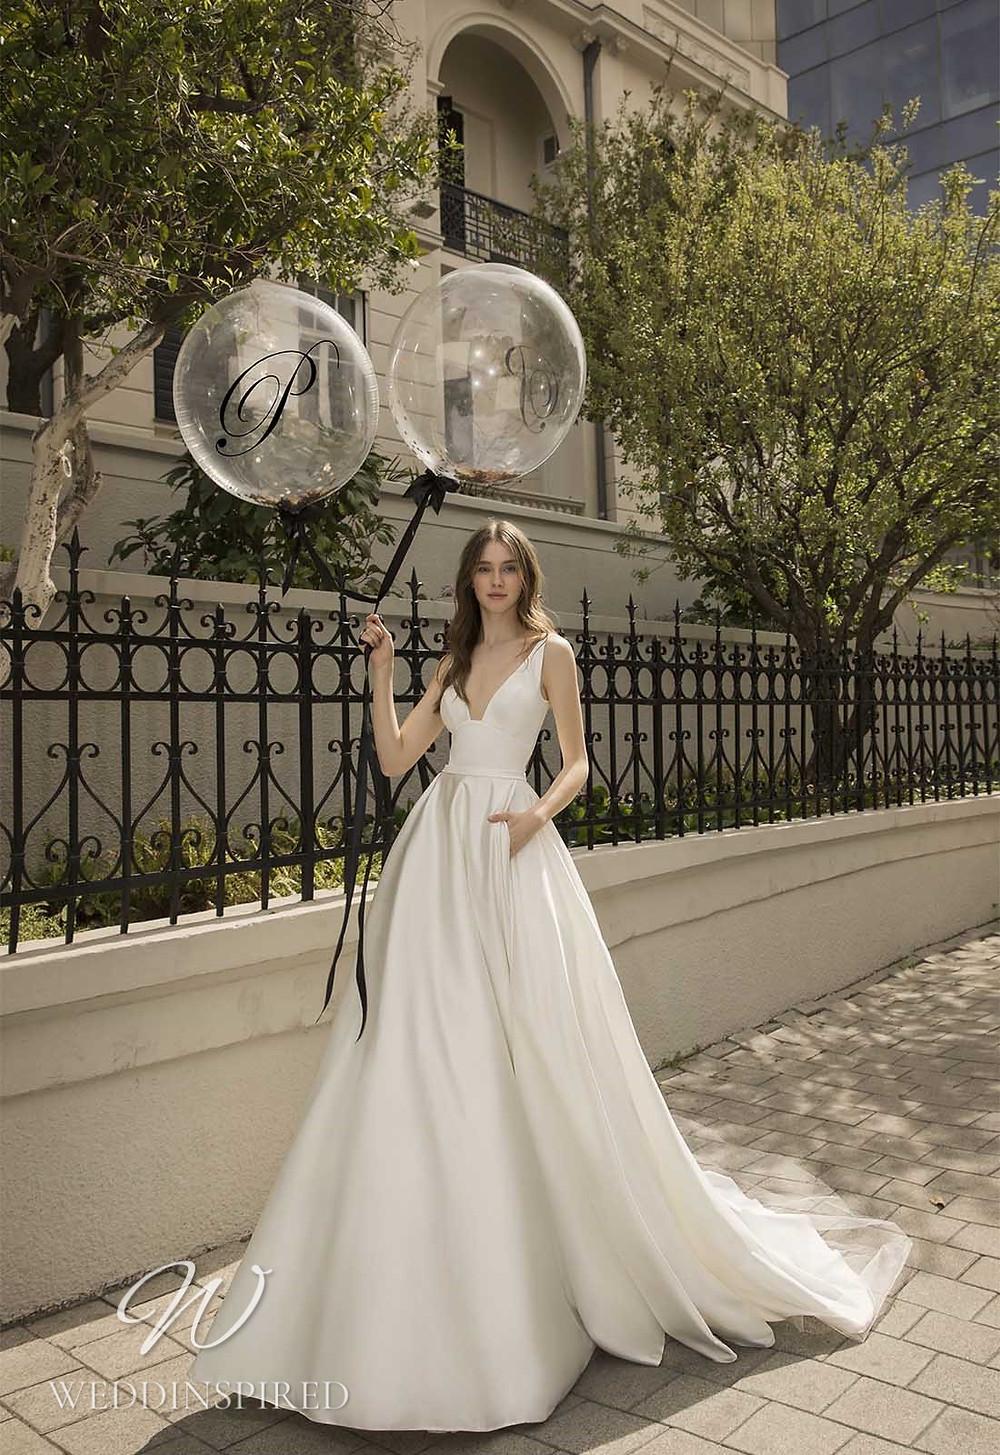 A Pnina Tornai 2021 satin A-line wedding dress with pockets